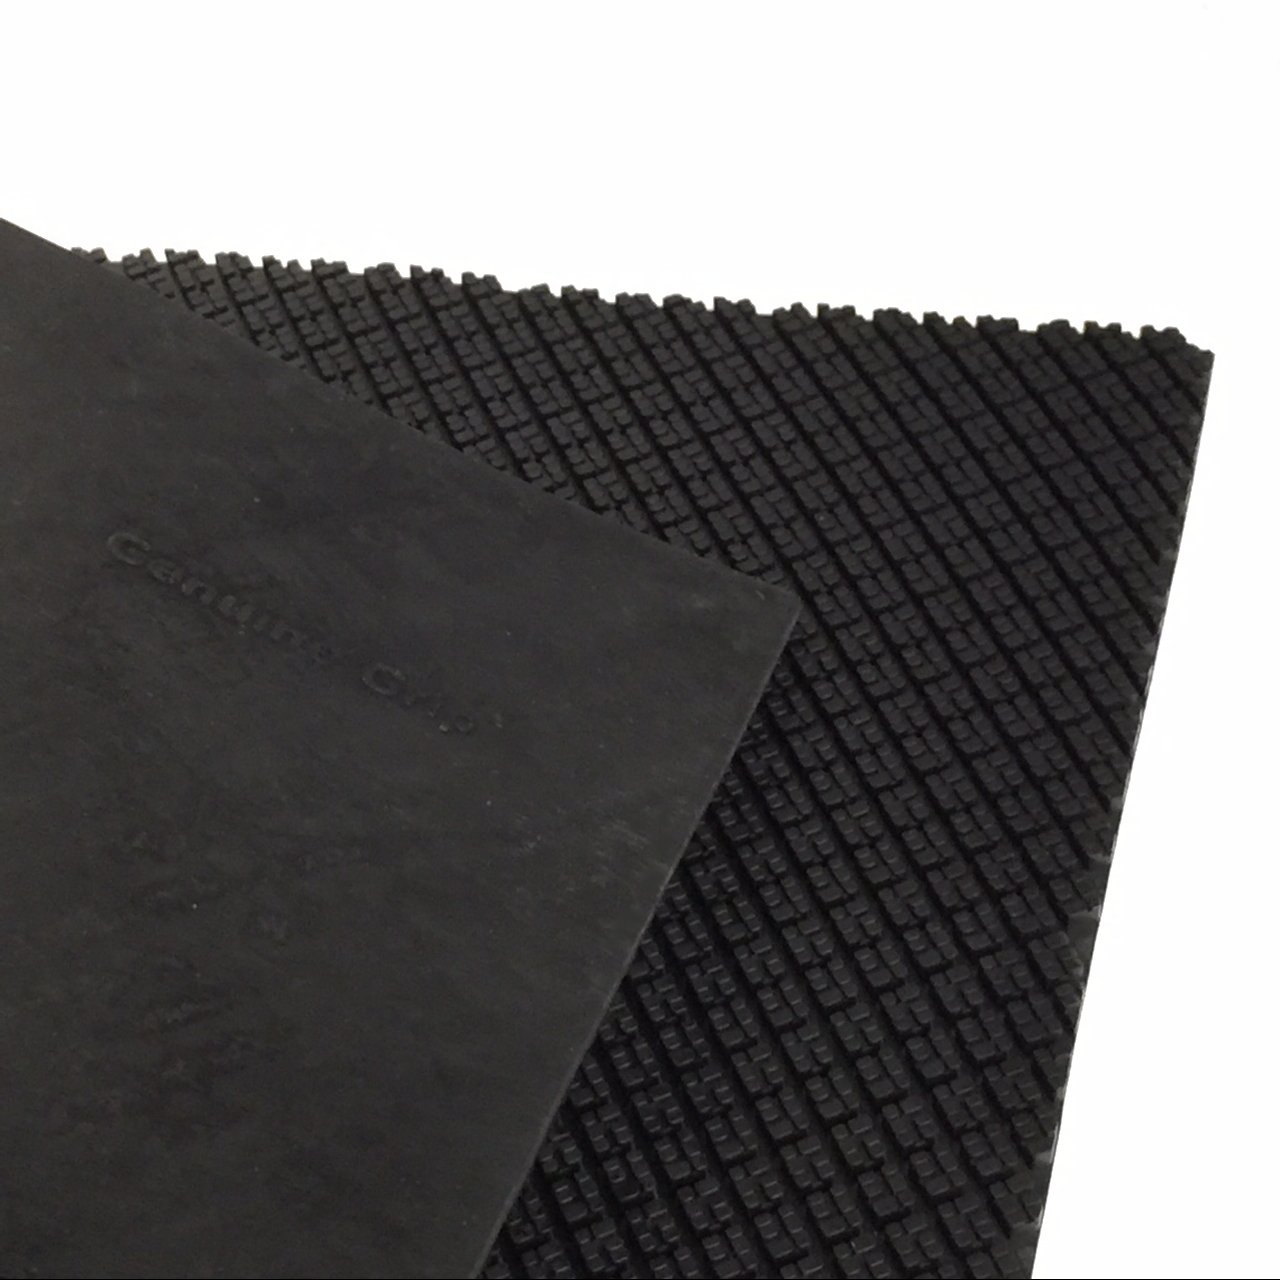 SoleTech Genuine Grip Soling Sheet, 4mm, Black